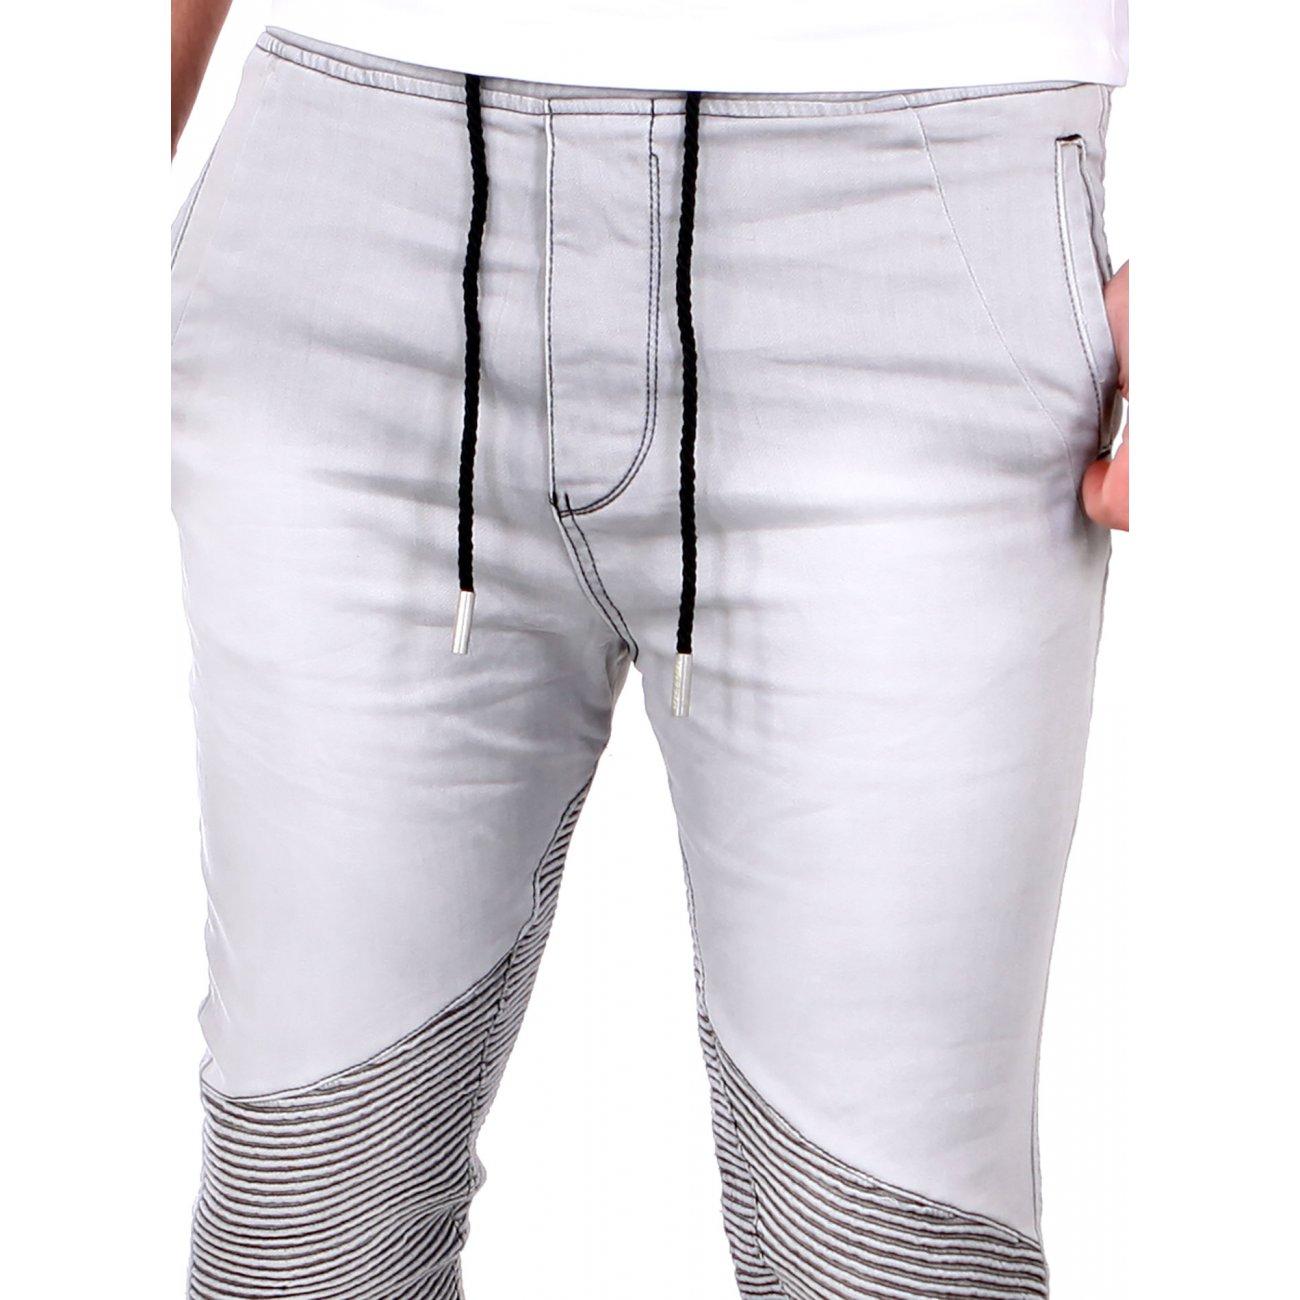 tazzio jeans jogginghose sweatpant jogg jeans biker grau. Black Bedroom Furniture Sets. Home Design Ideas